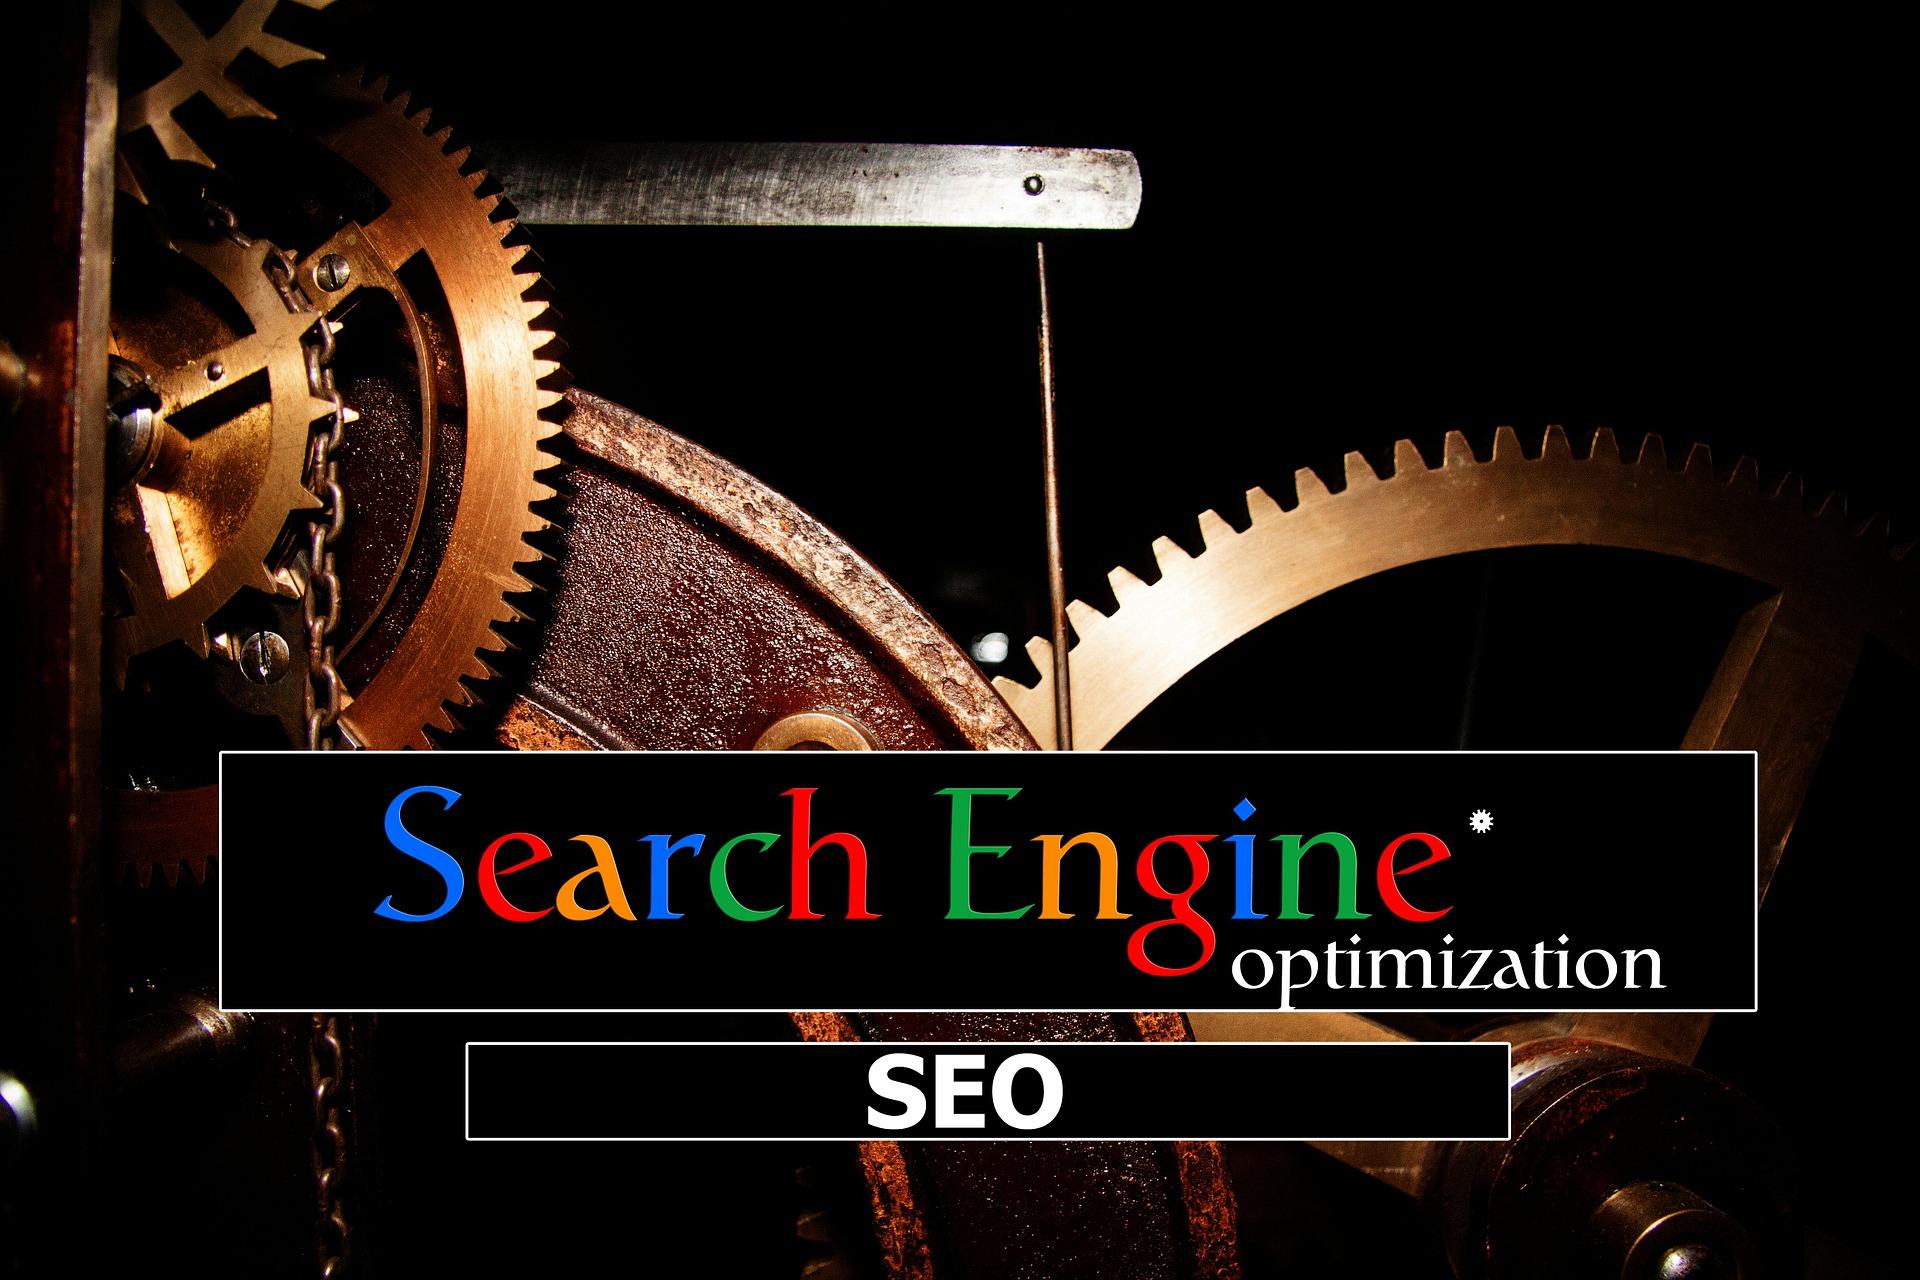 Boost Brand Identity via Search Engine Optimization